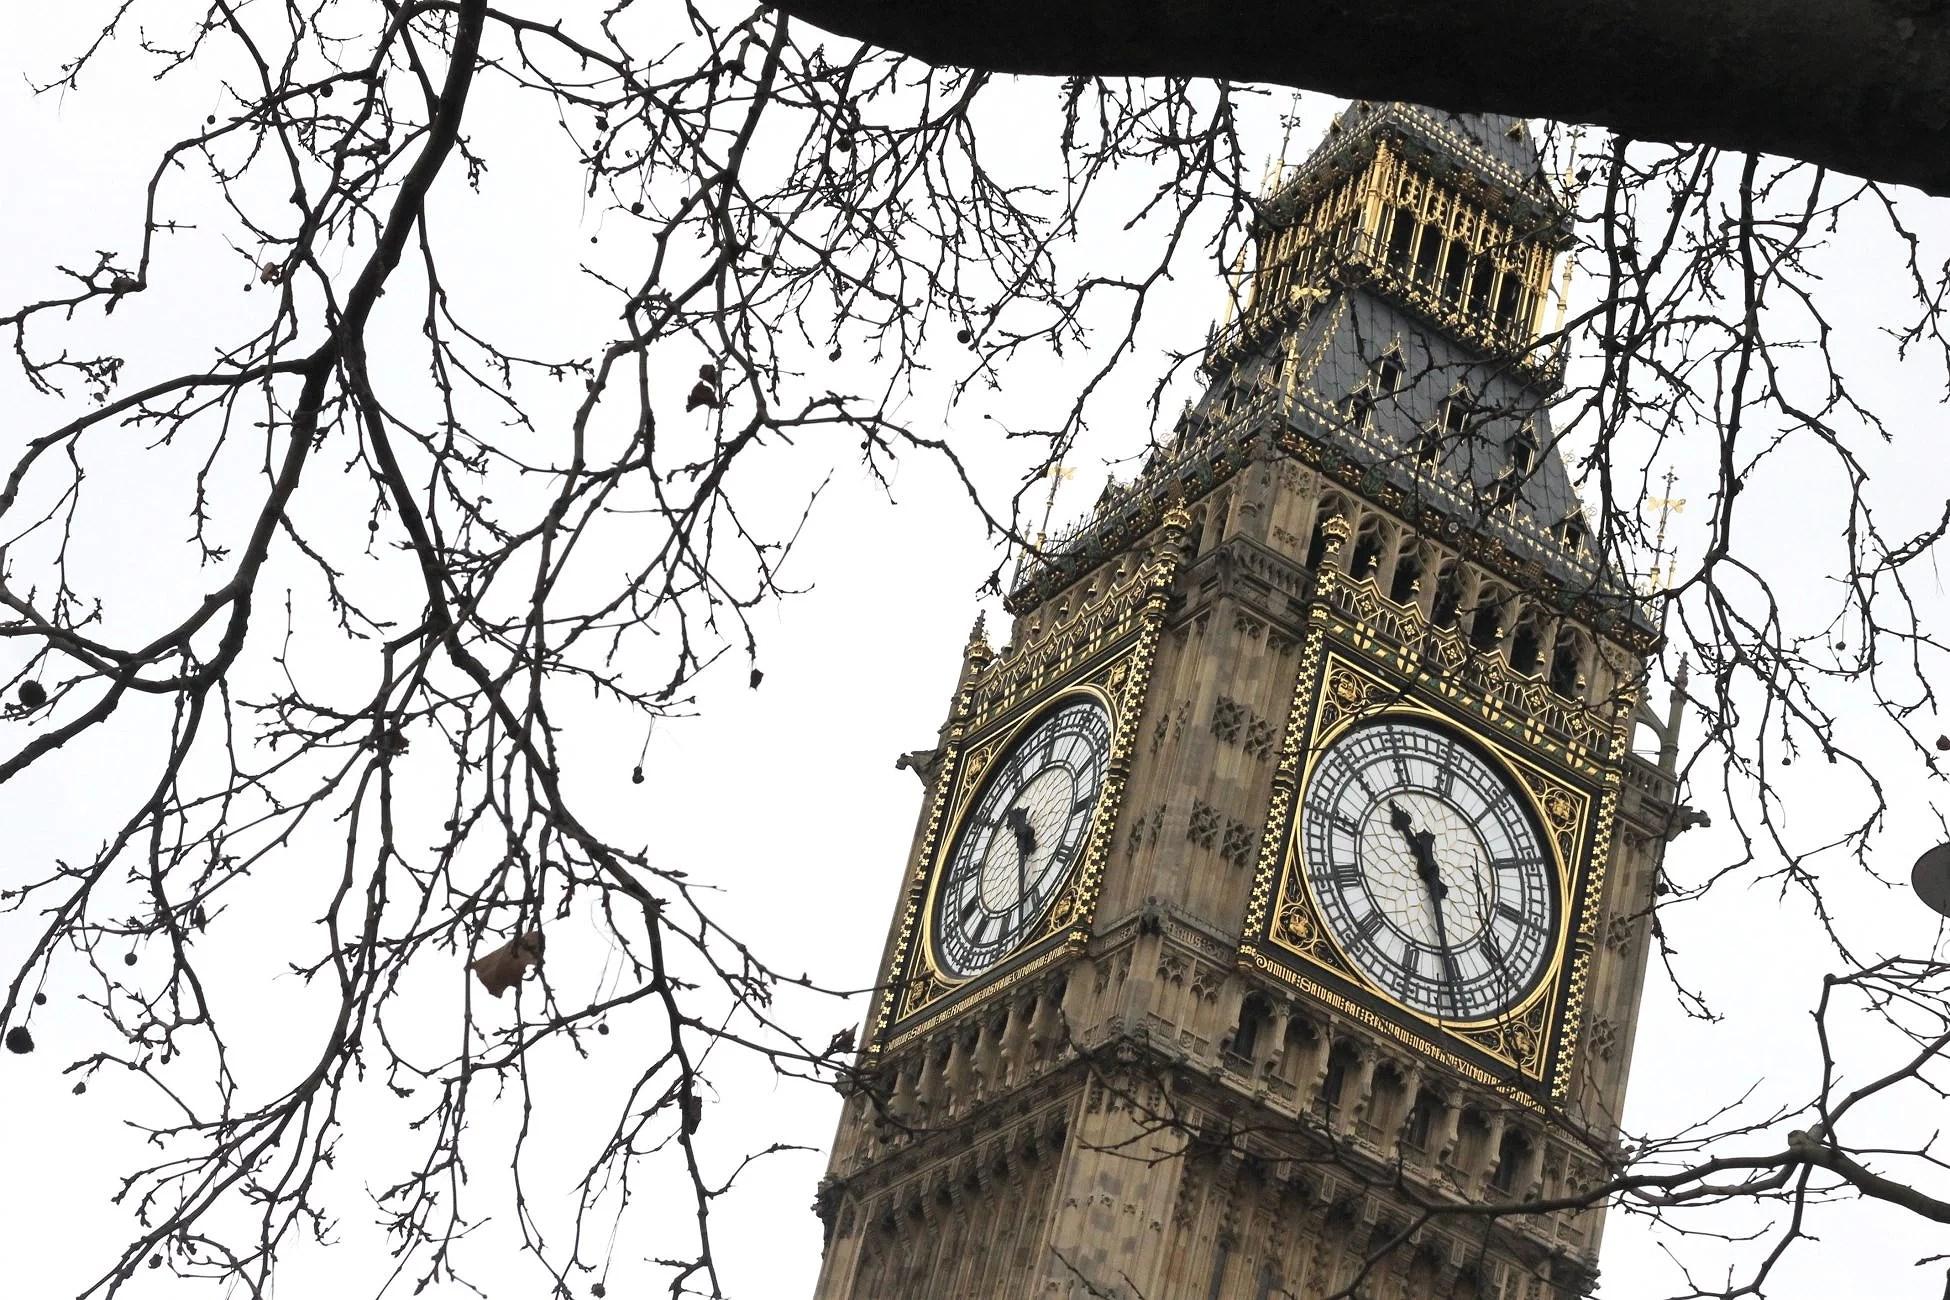 London. Big Ben